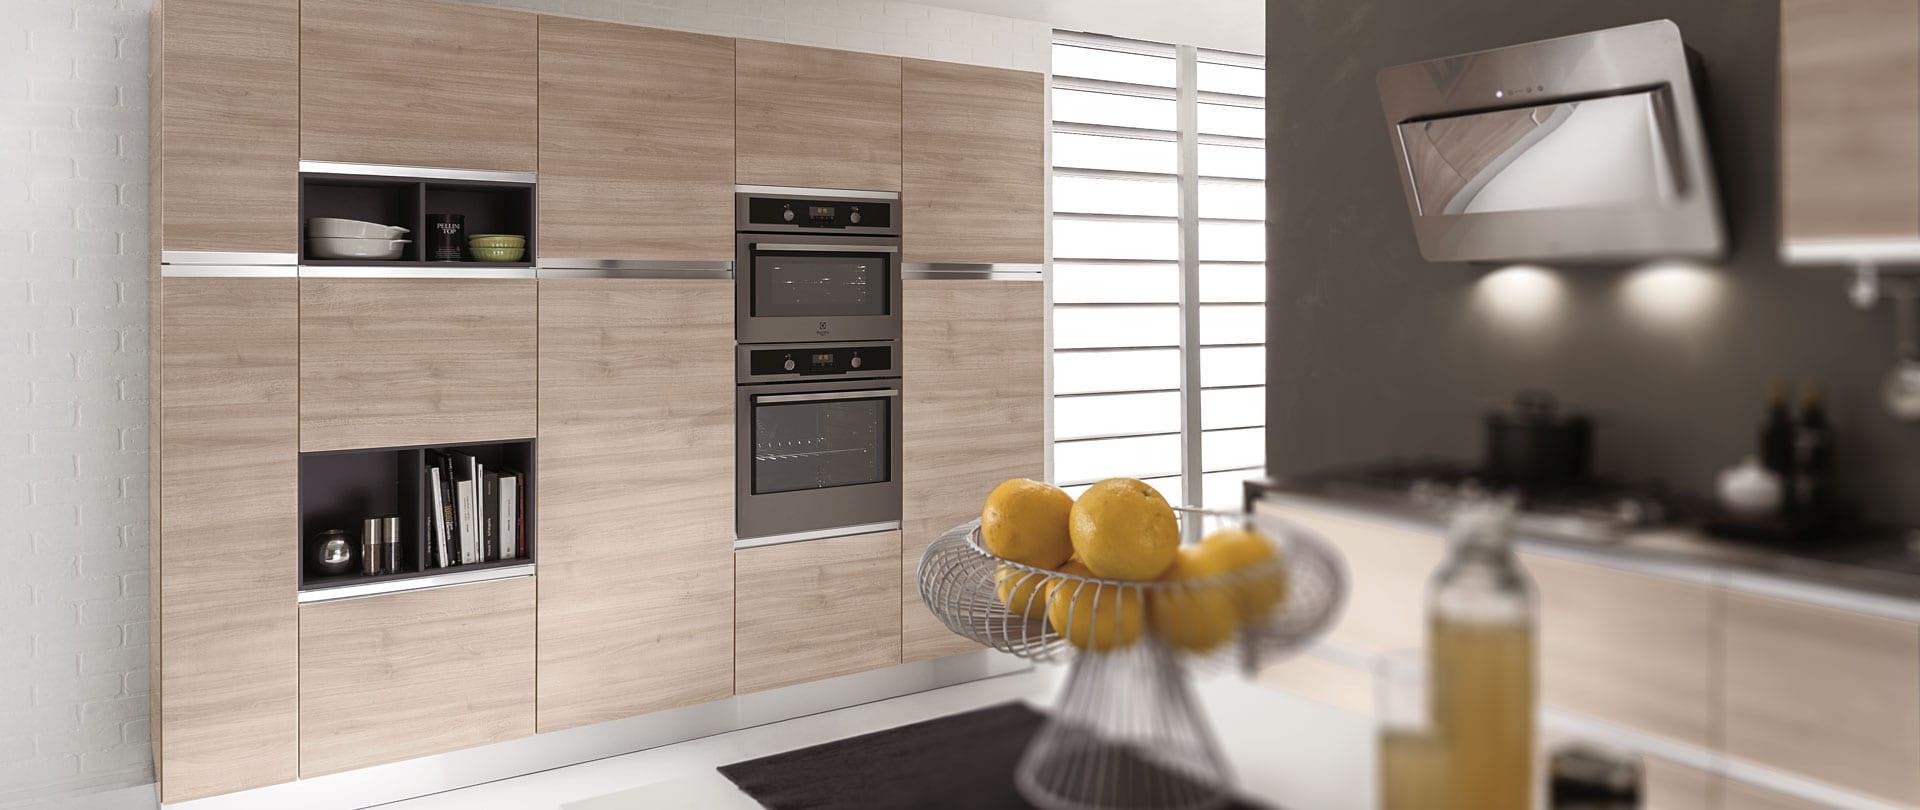 06-cucina-moderna-newmeg-tranche-naturale